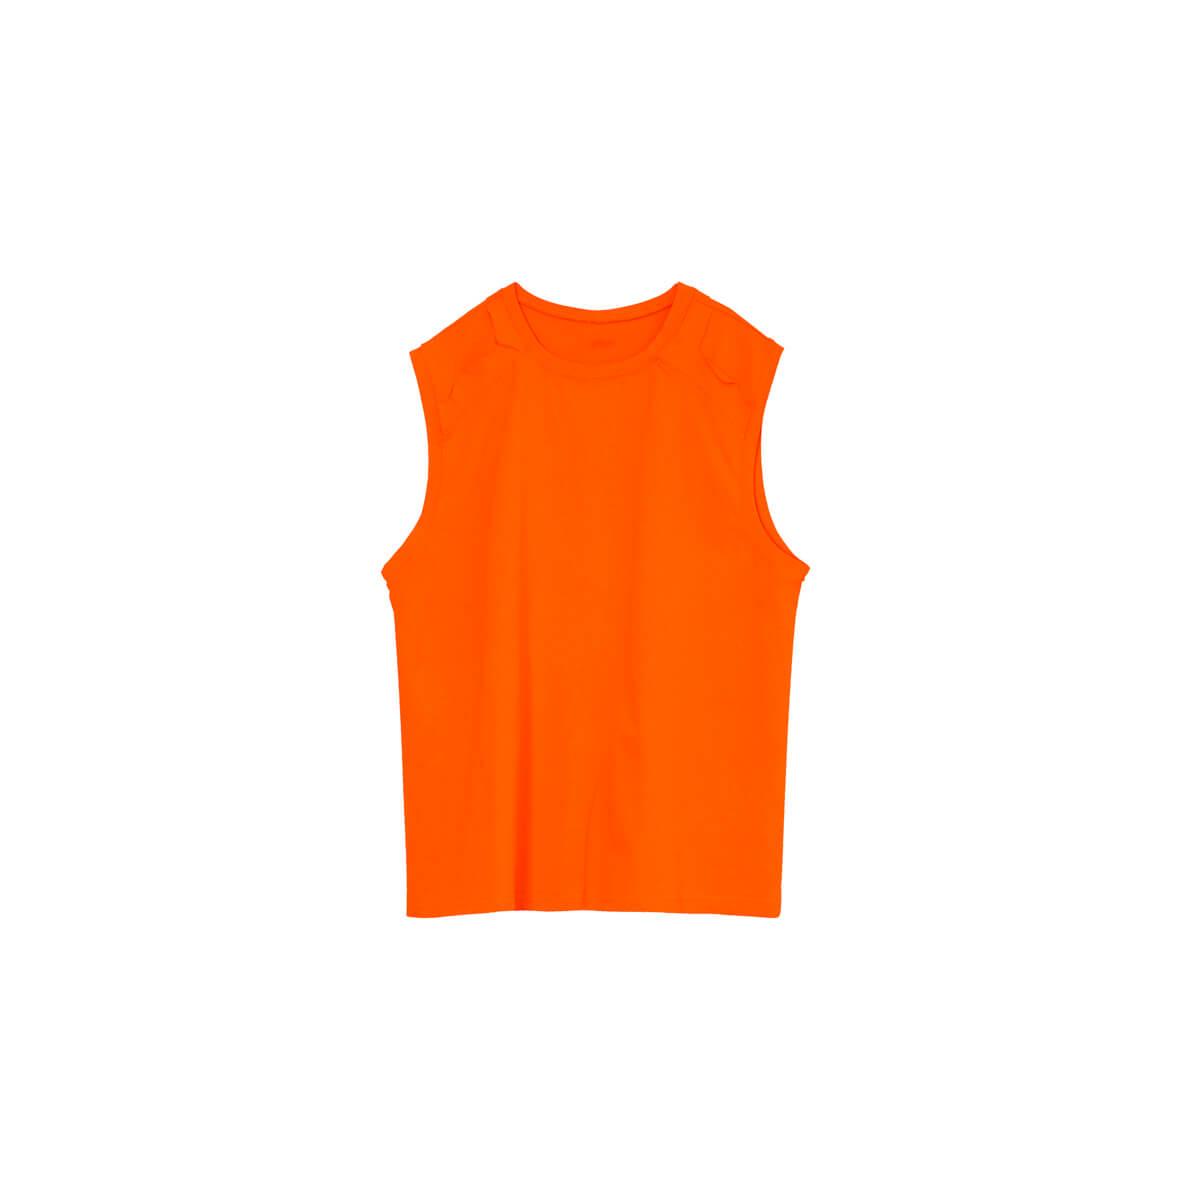 Майка Cui Layout Studio Tank Top Ripped Shoulders Orange